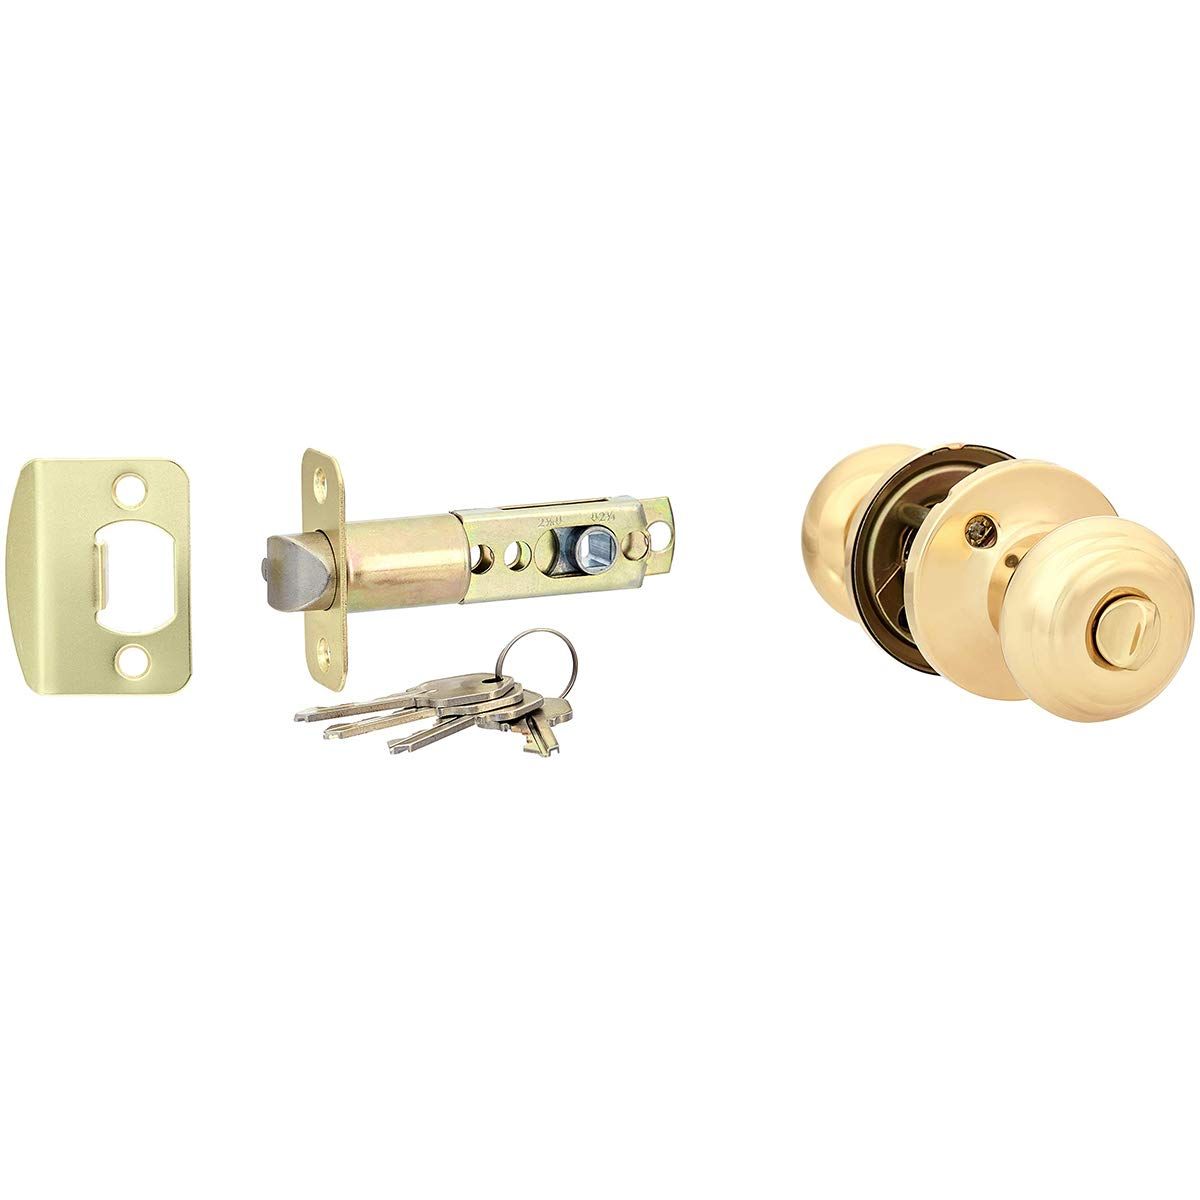 AmazonBasics Entry Knob and Deadbolt - Classic - Polished Brass – 2-Pack by AmazonBasics (Image #2)